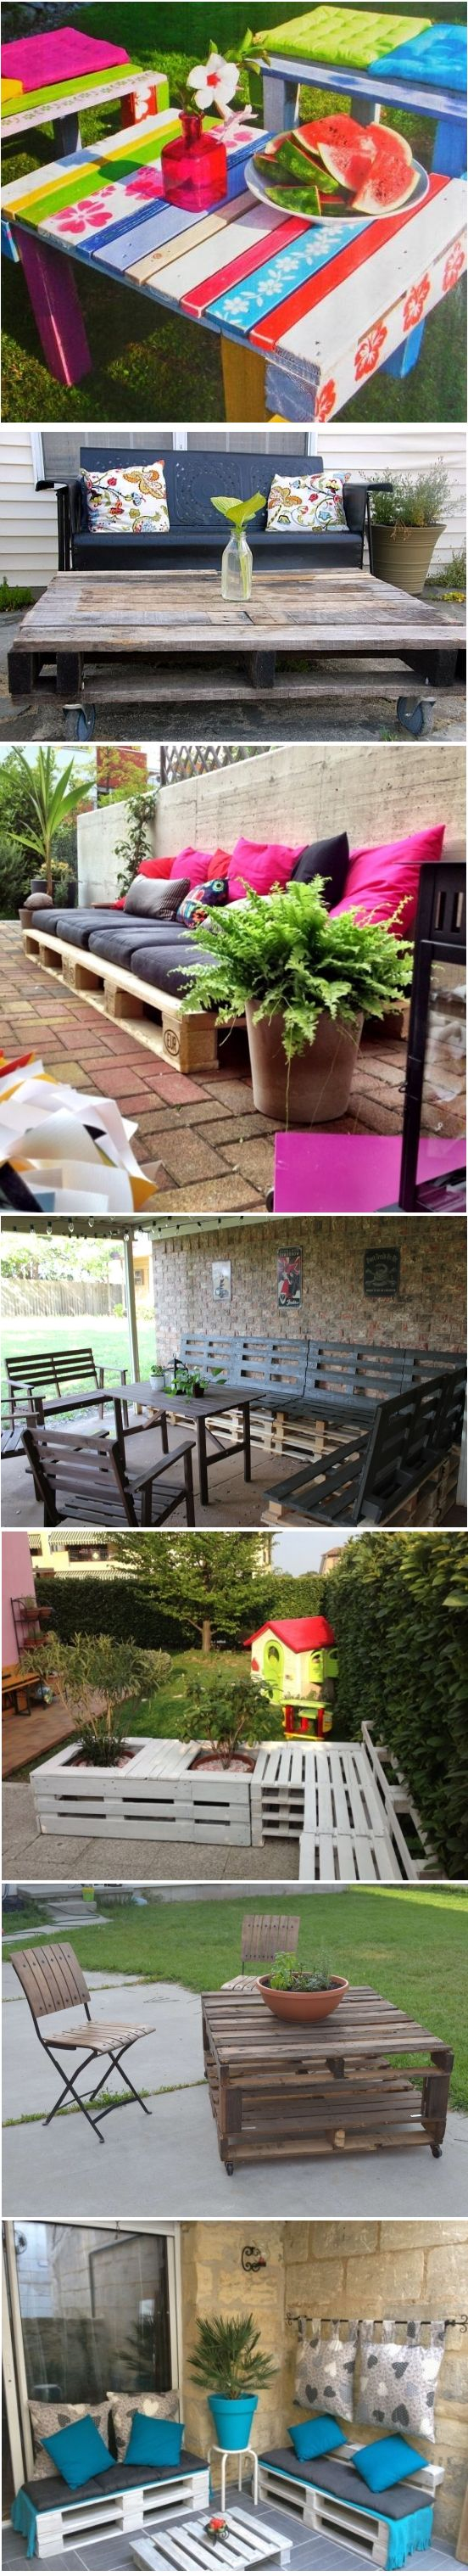 DIY outdoor wooden pallets furniture